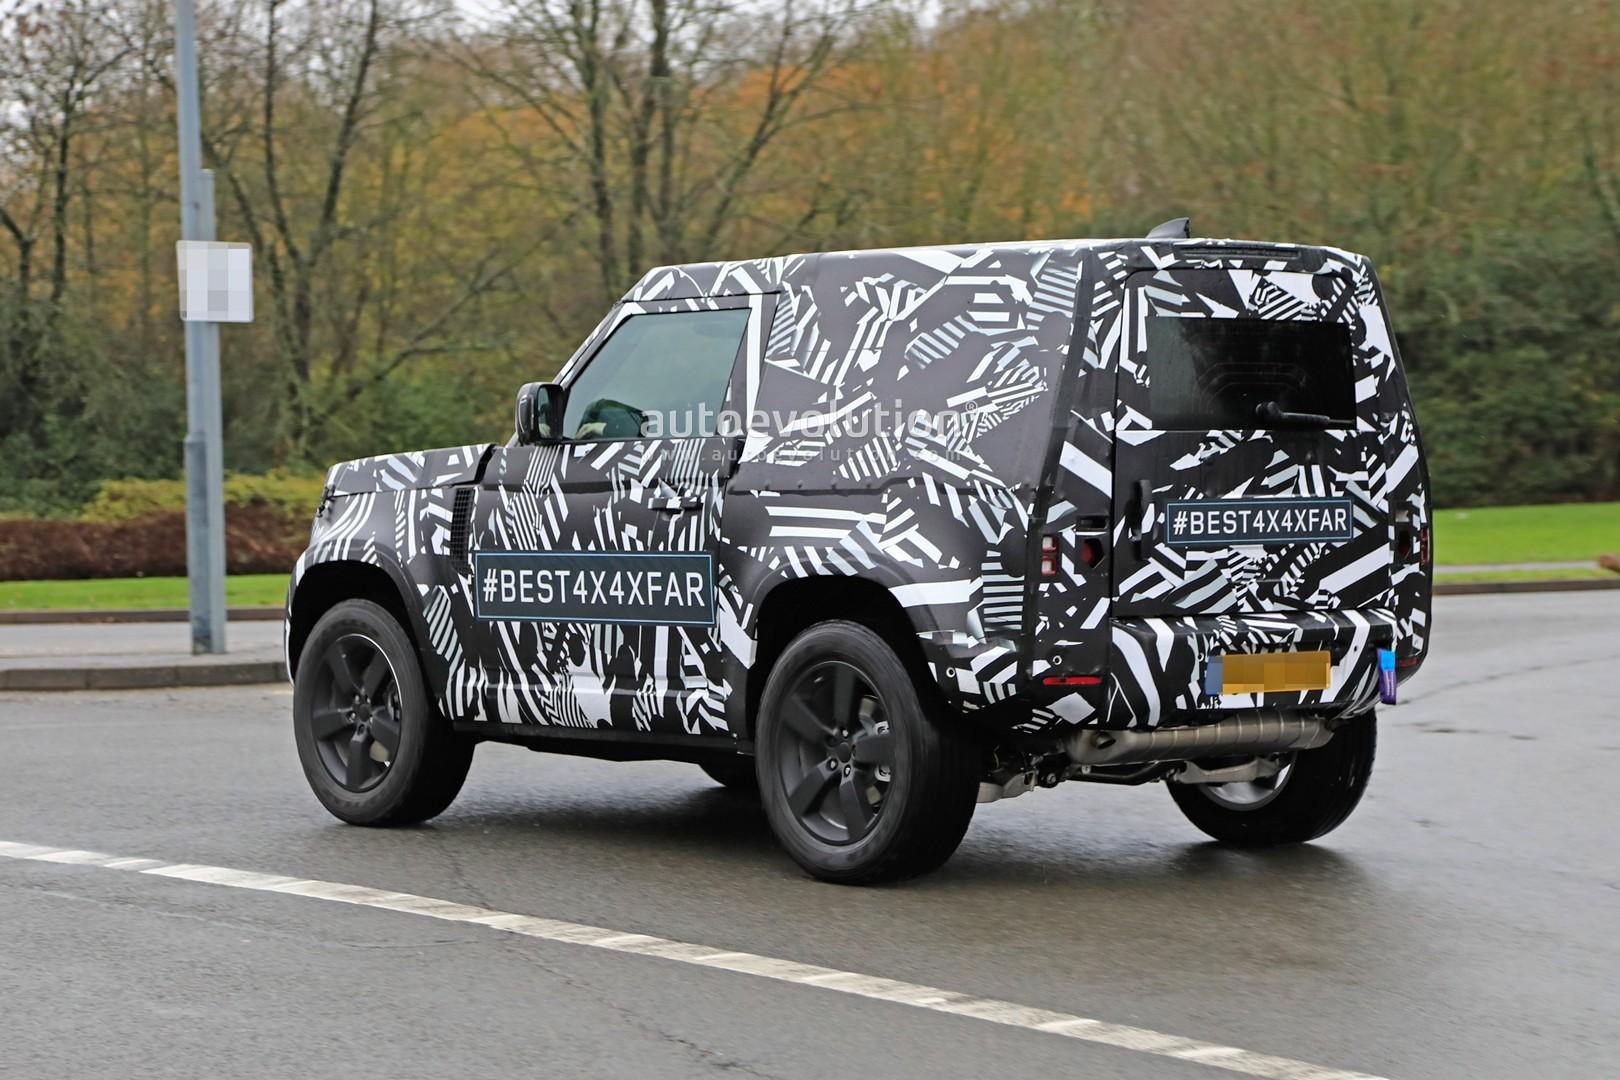 2020 Land Rover Defender 90 Has Short Wheelbase and Three ...